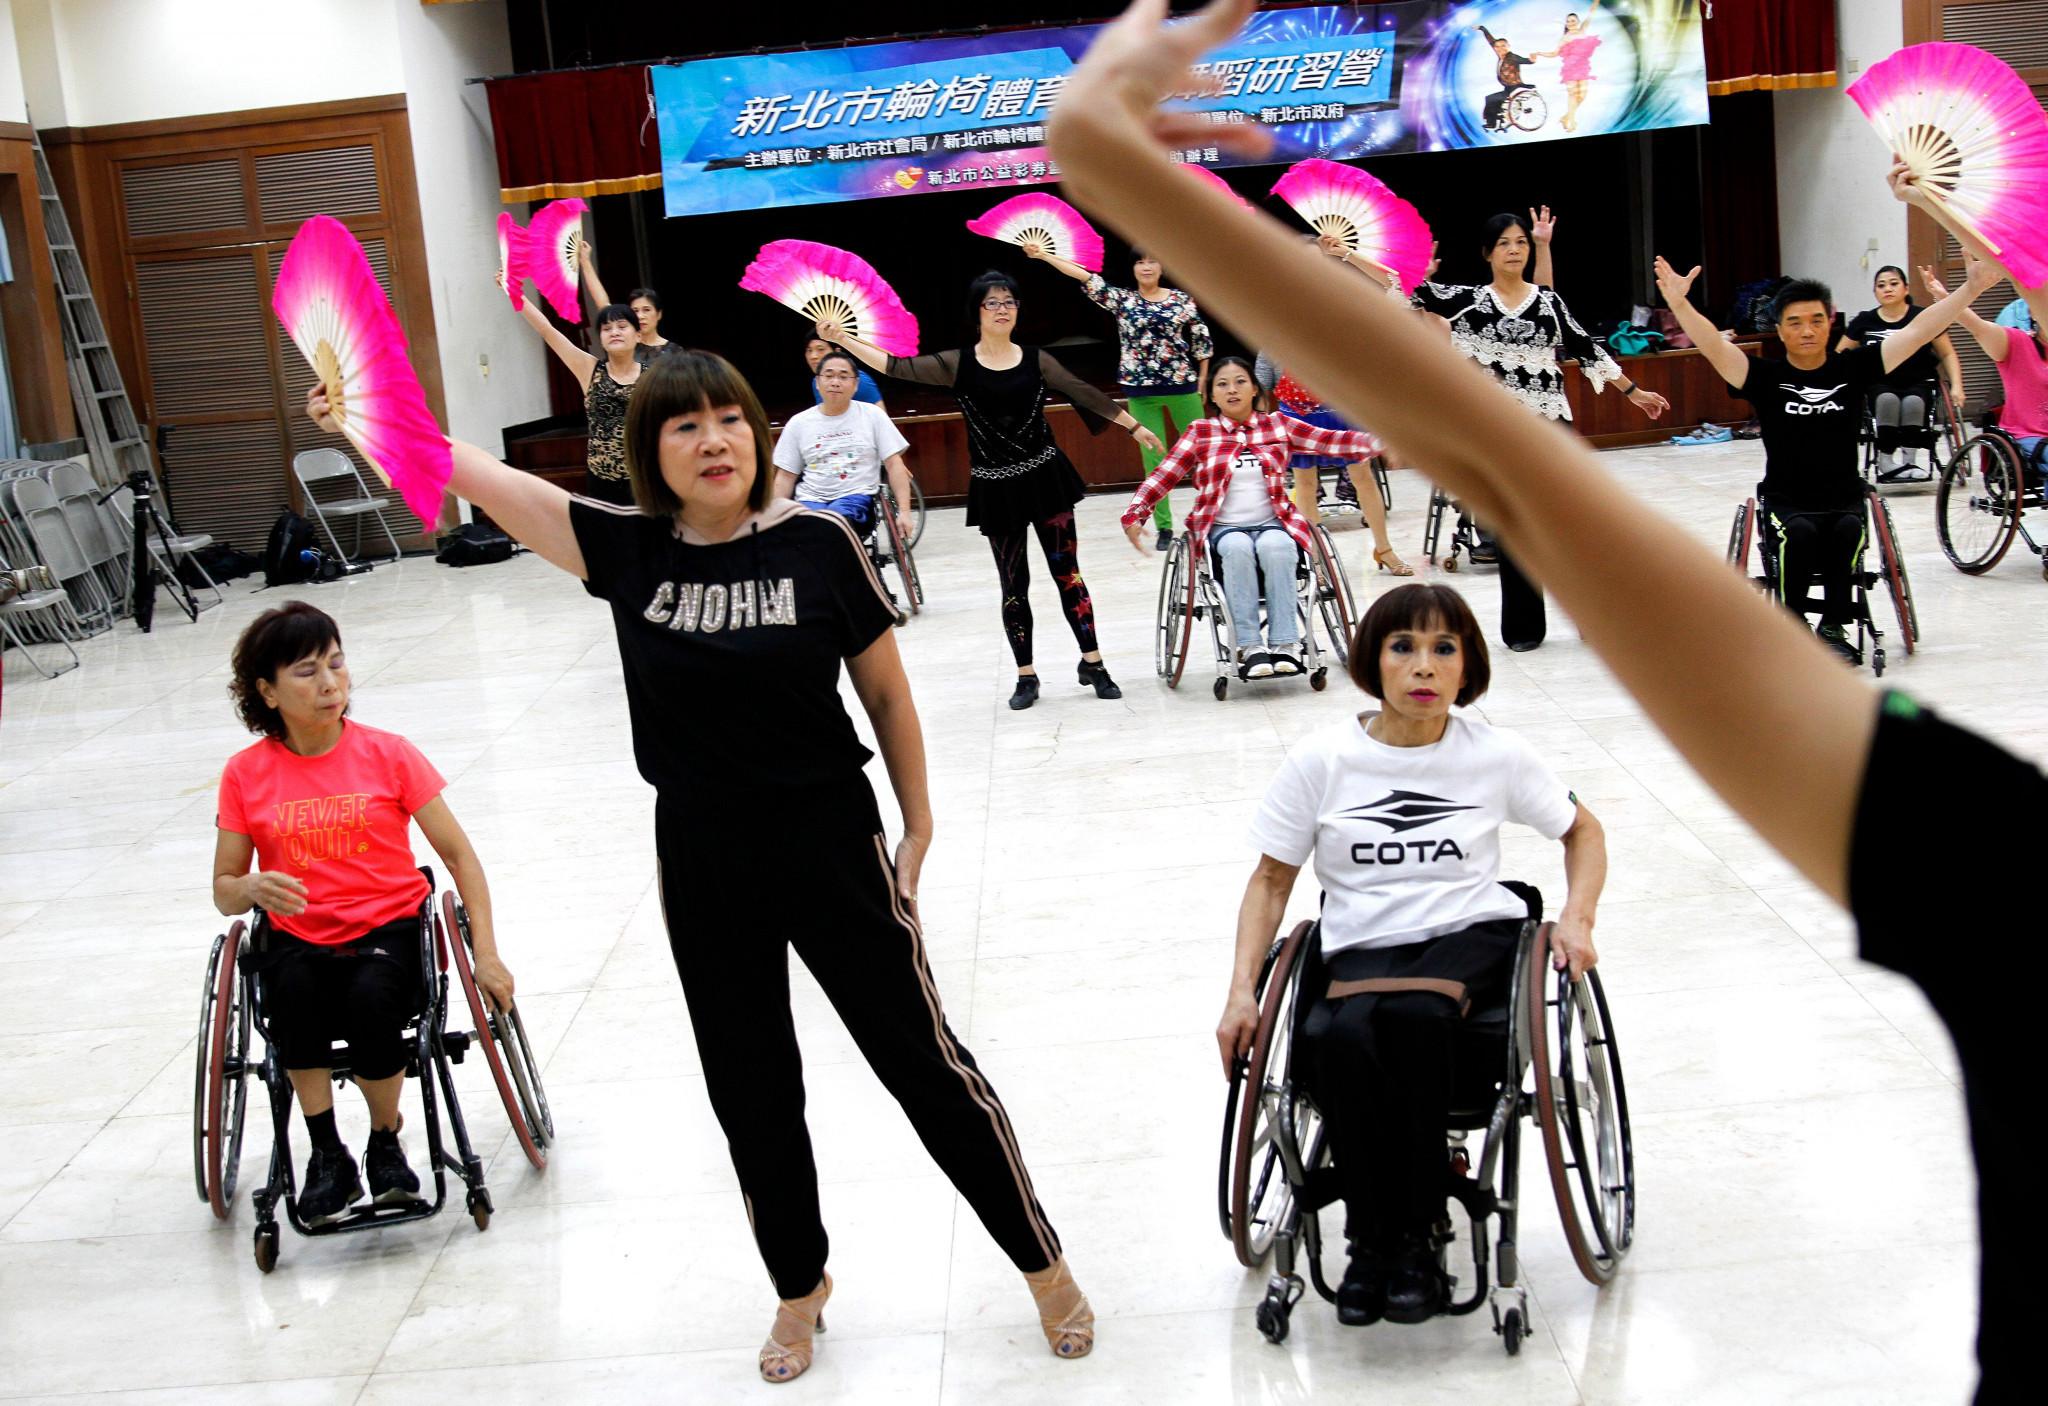 IPC and World DanceSport Federation discuss transfer of Para-dance governance